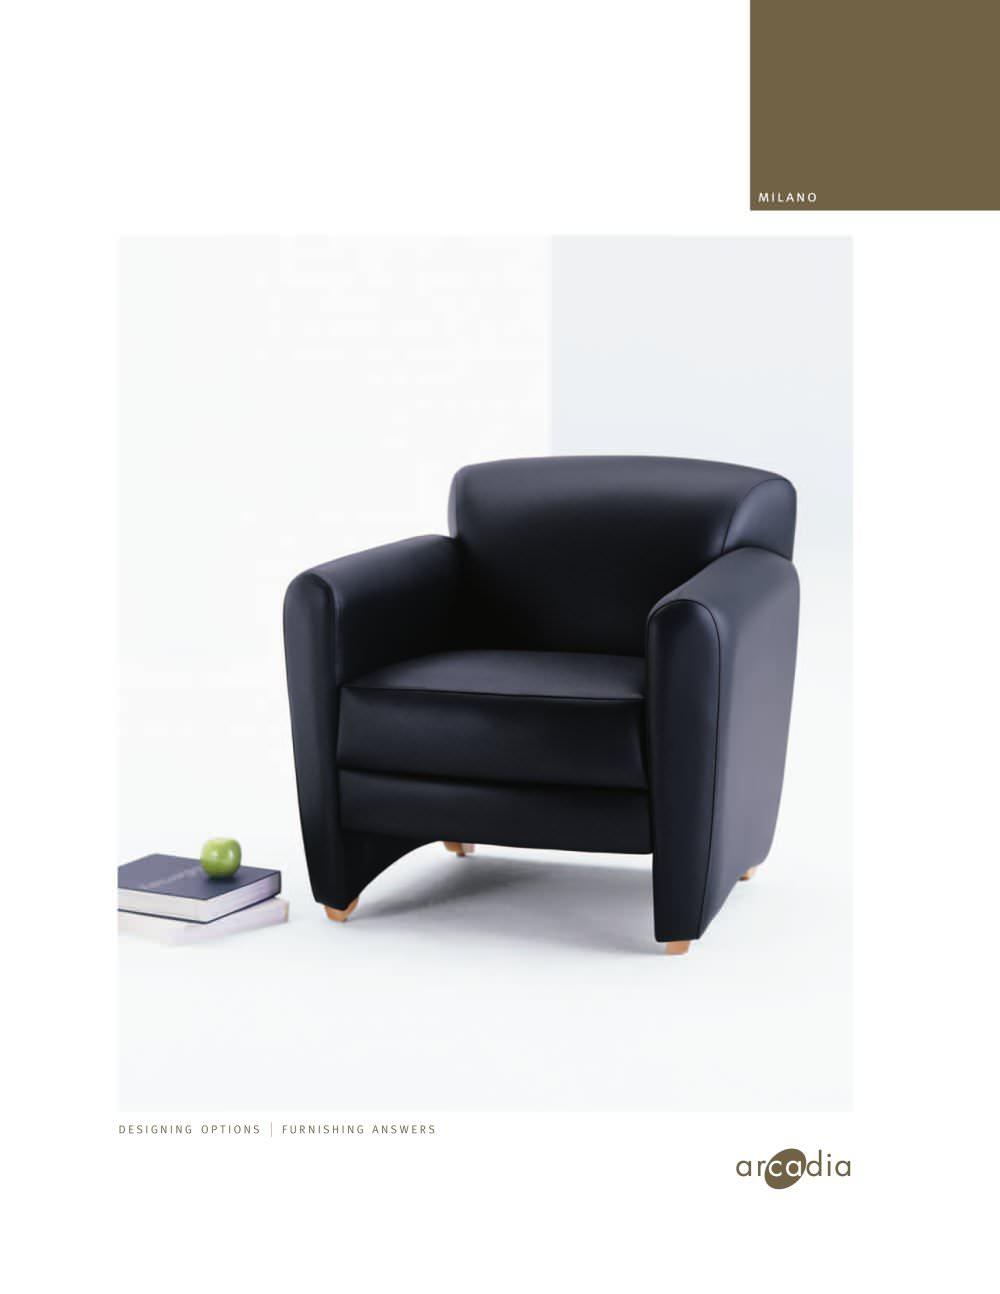 Superb Milano Lounge Arcadia Pdf Catalogs Technical Documentation Beatyapartments Chair Design Images Beatyapartmentscom